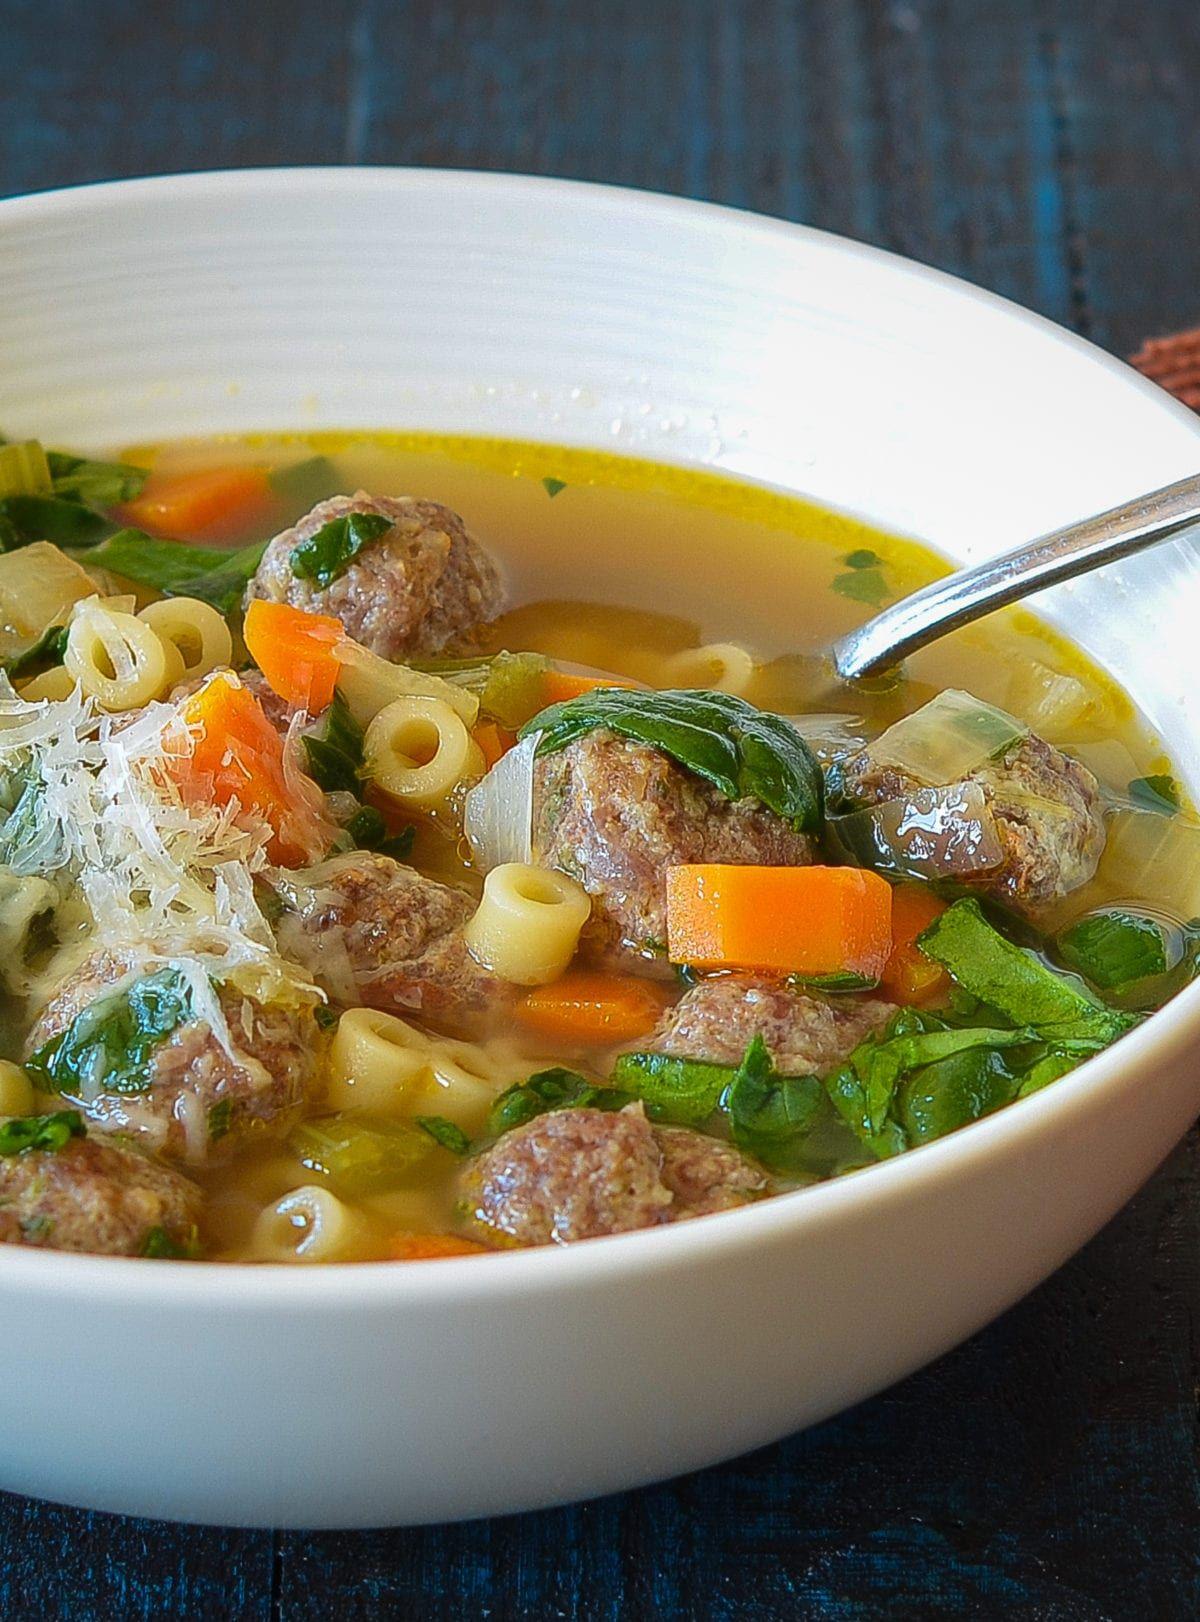 Italian Wedding Soup Italian recipes, Dinner, Italian